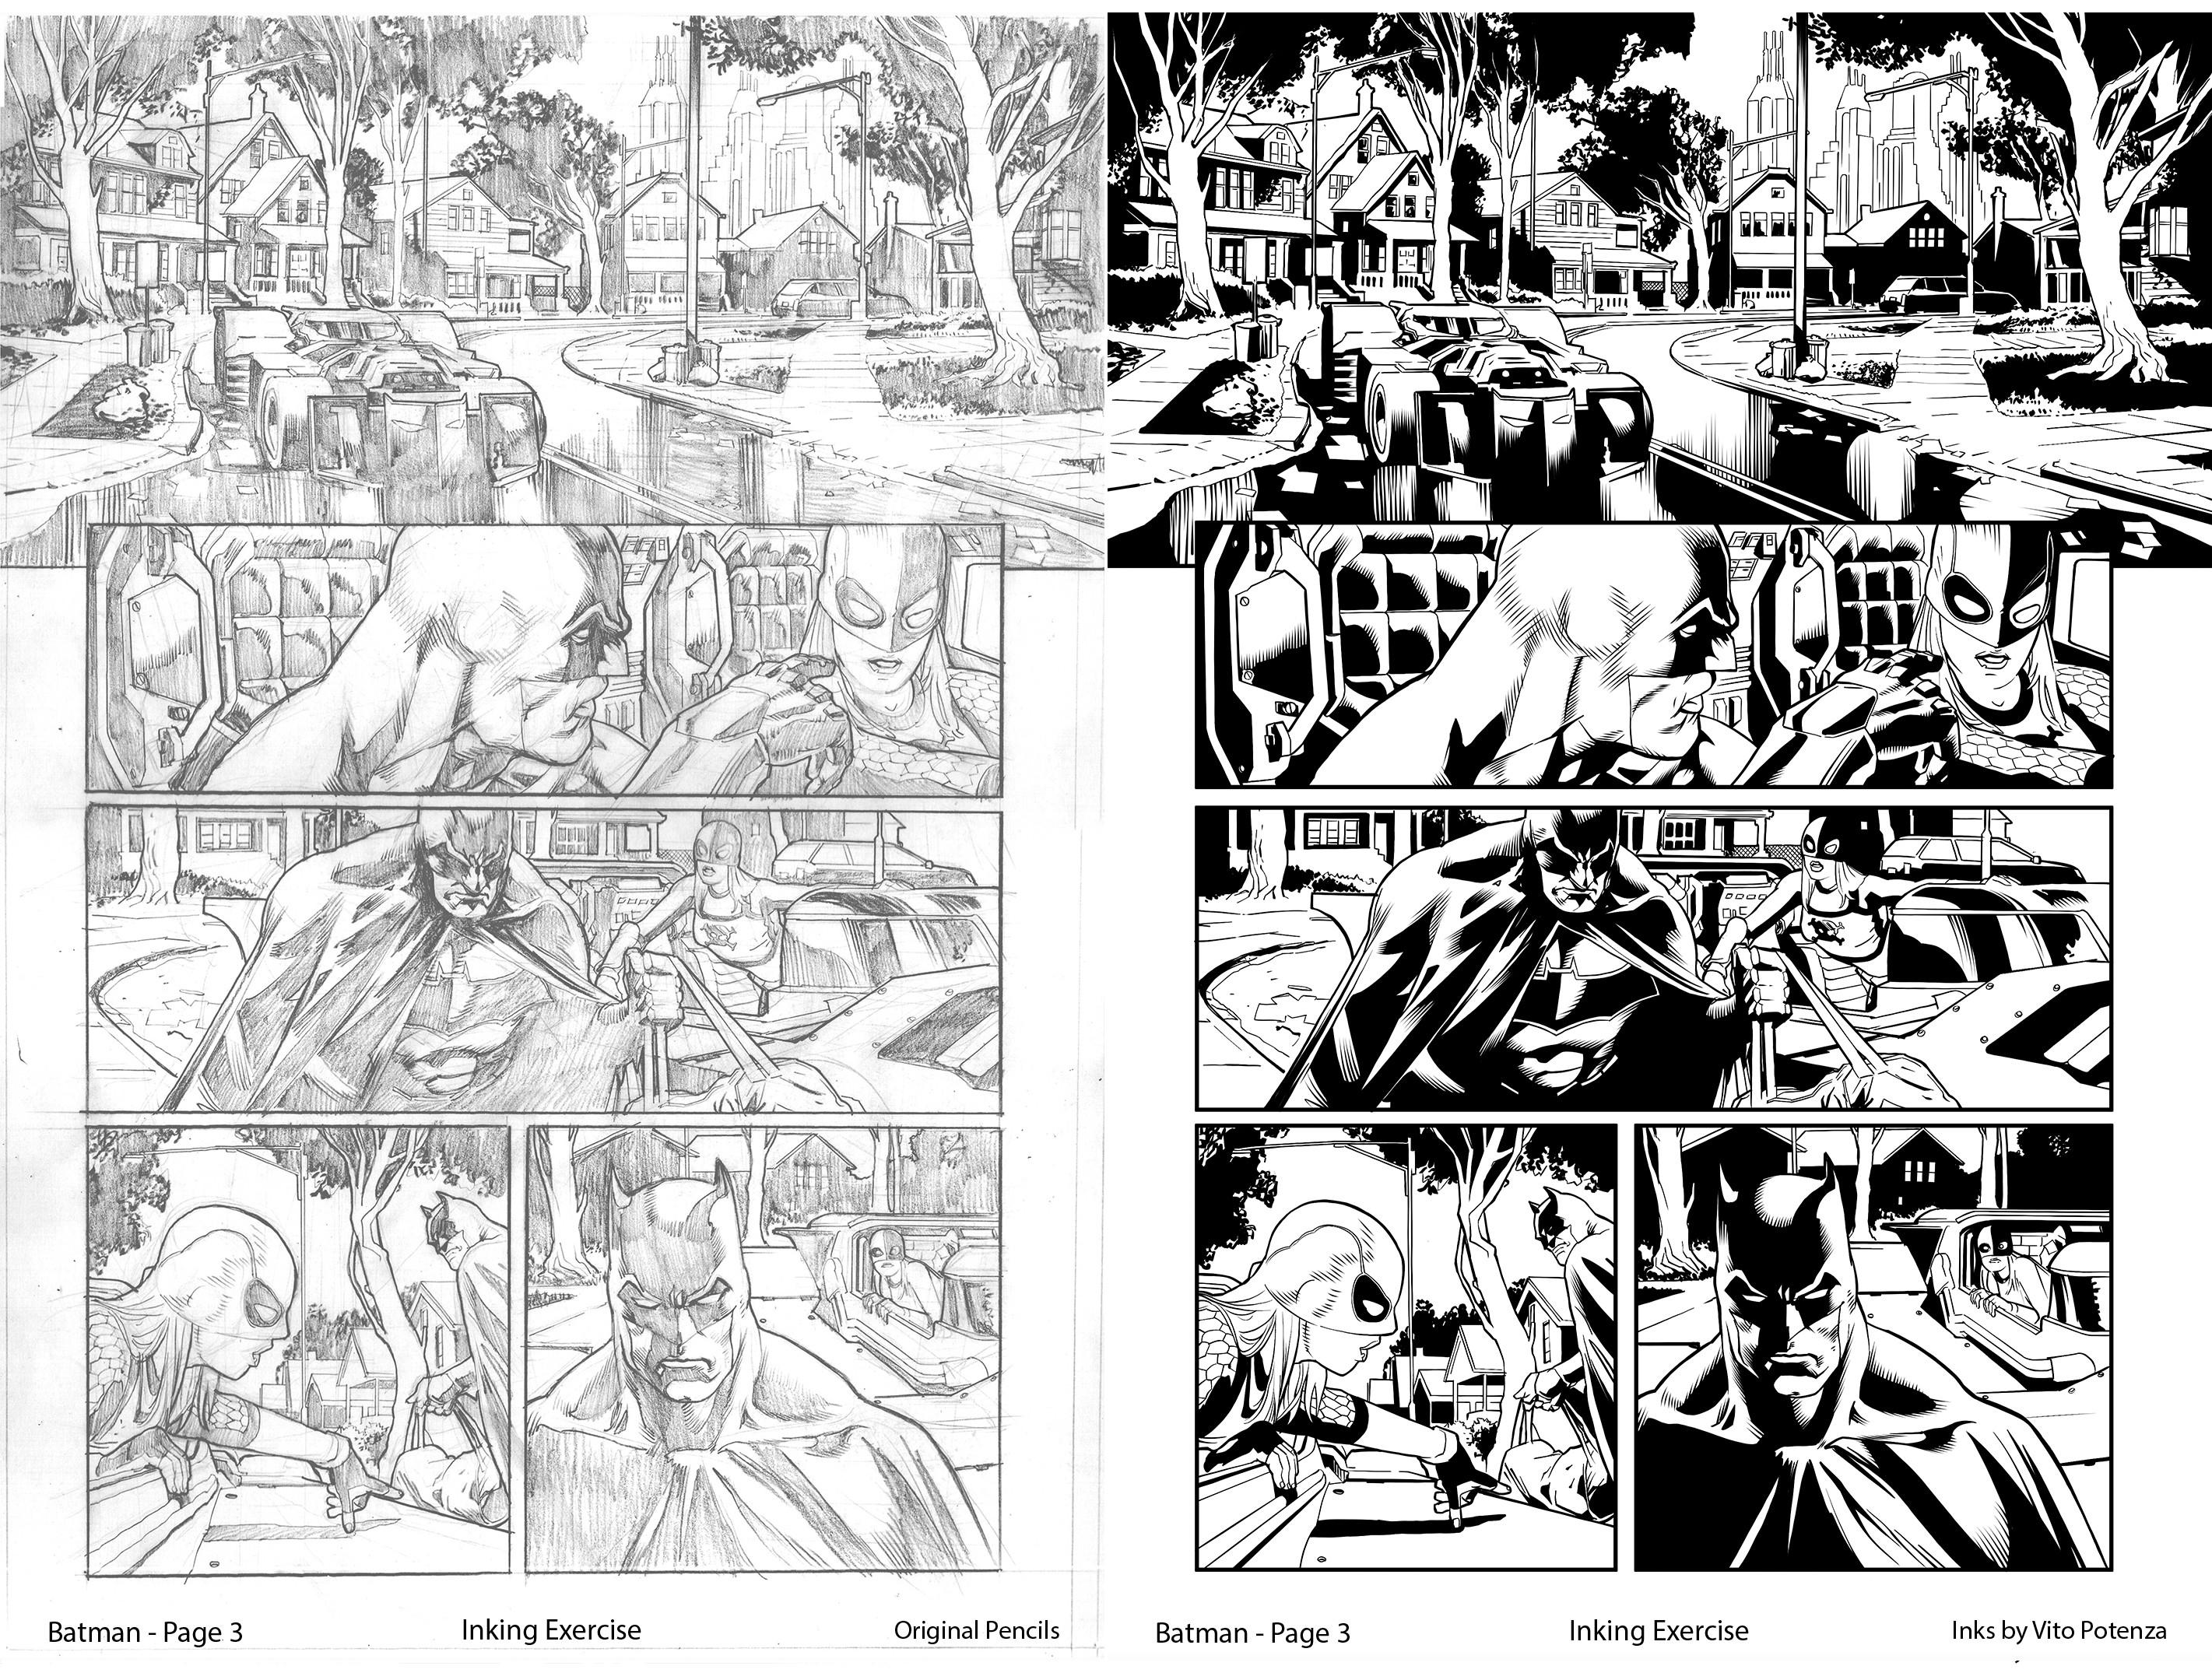 Batman Page 3 - Inked by me